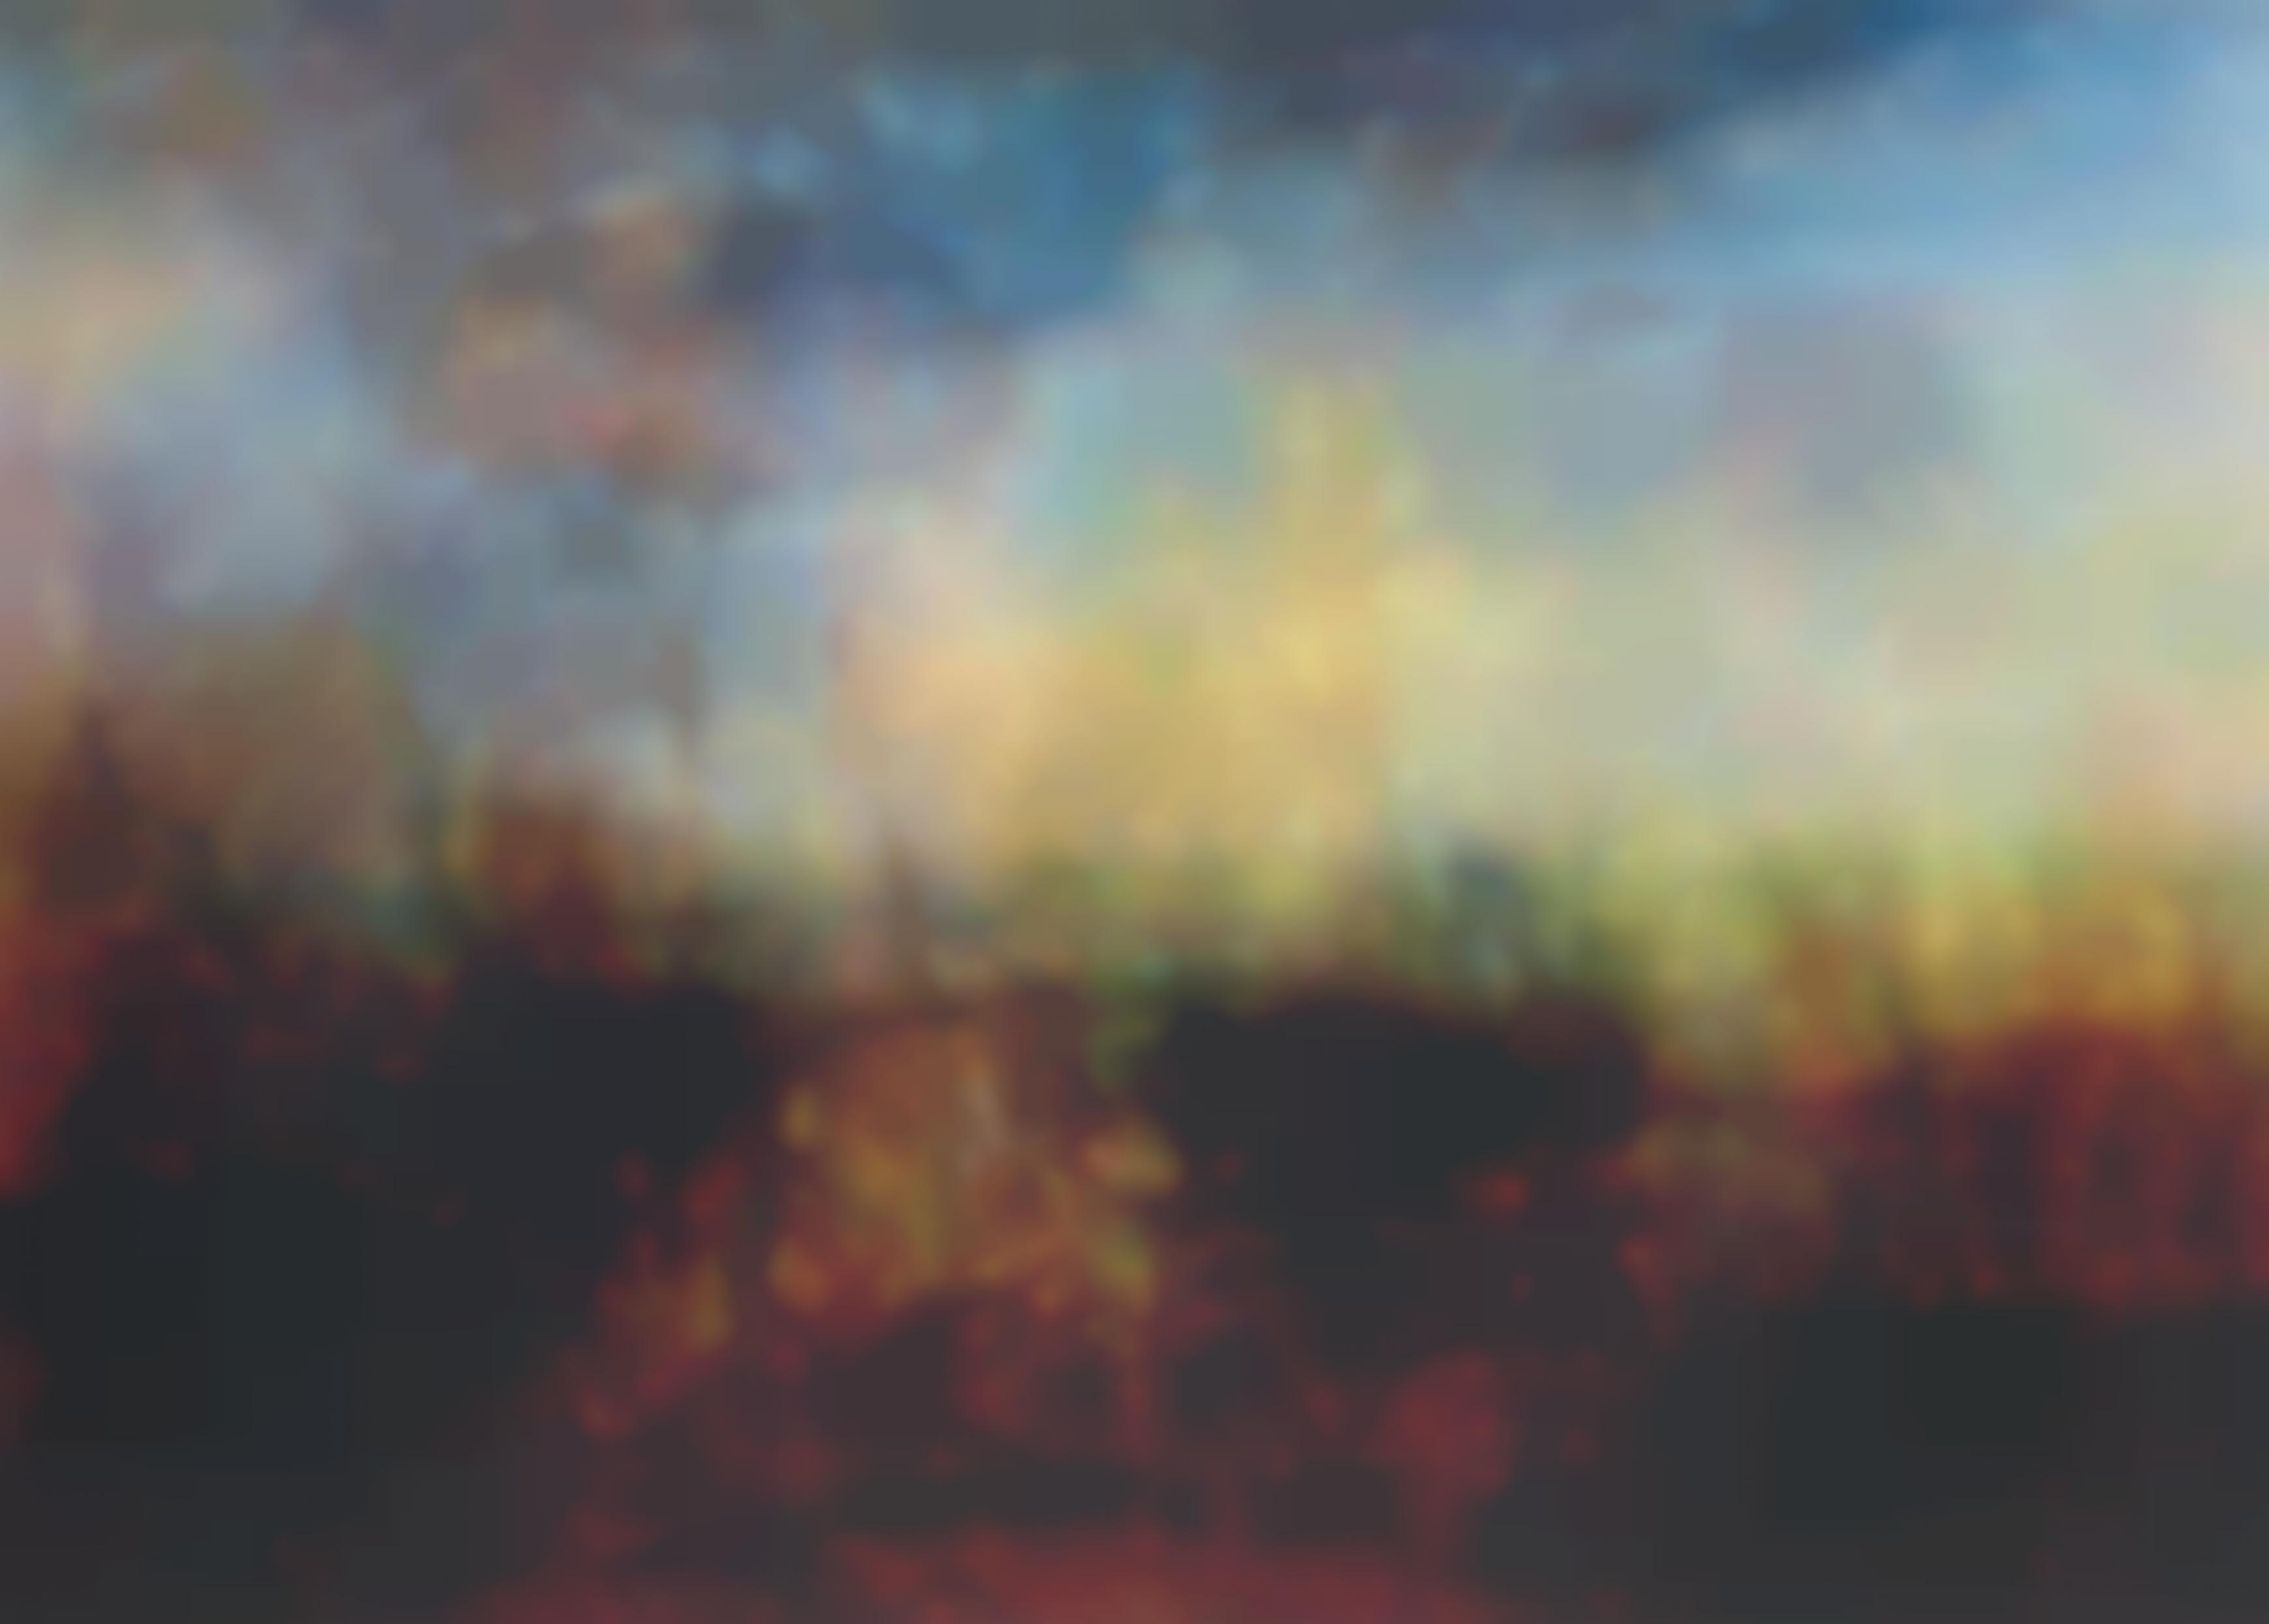 Idris Khan-Every...William Turner Postcard From Tate Britain-2004